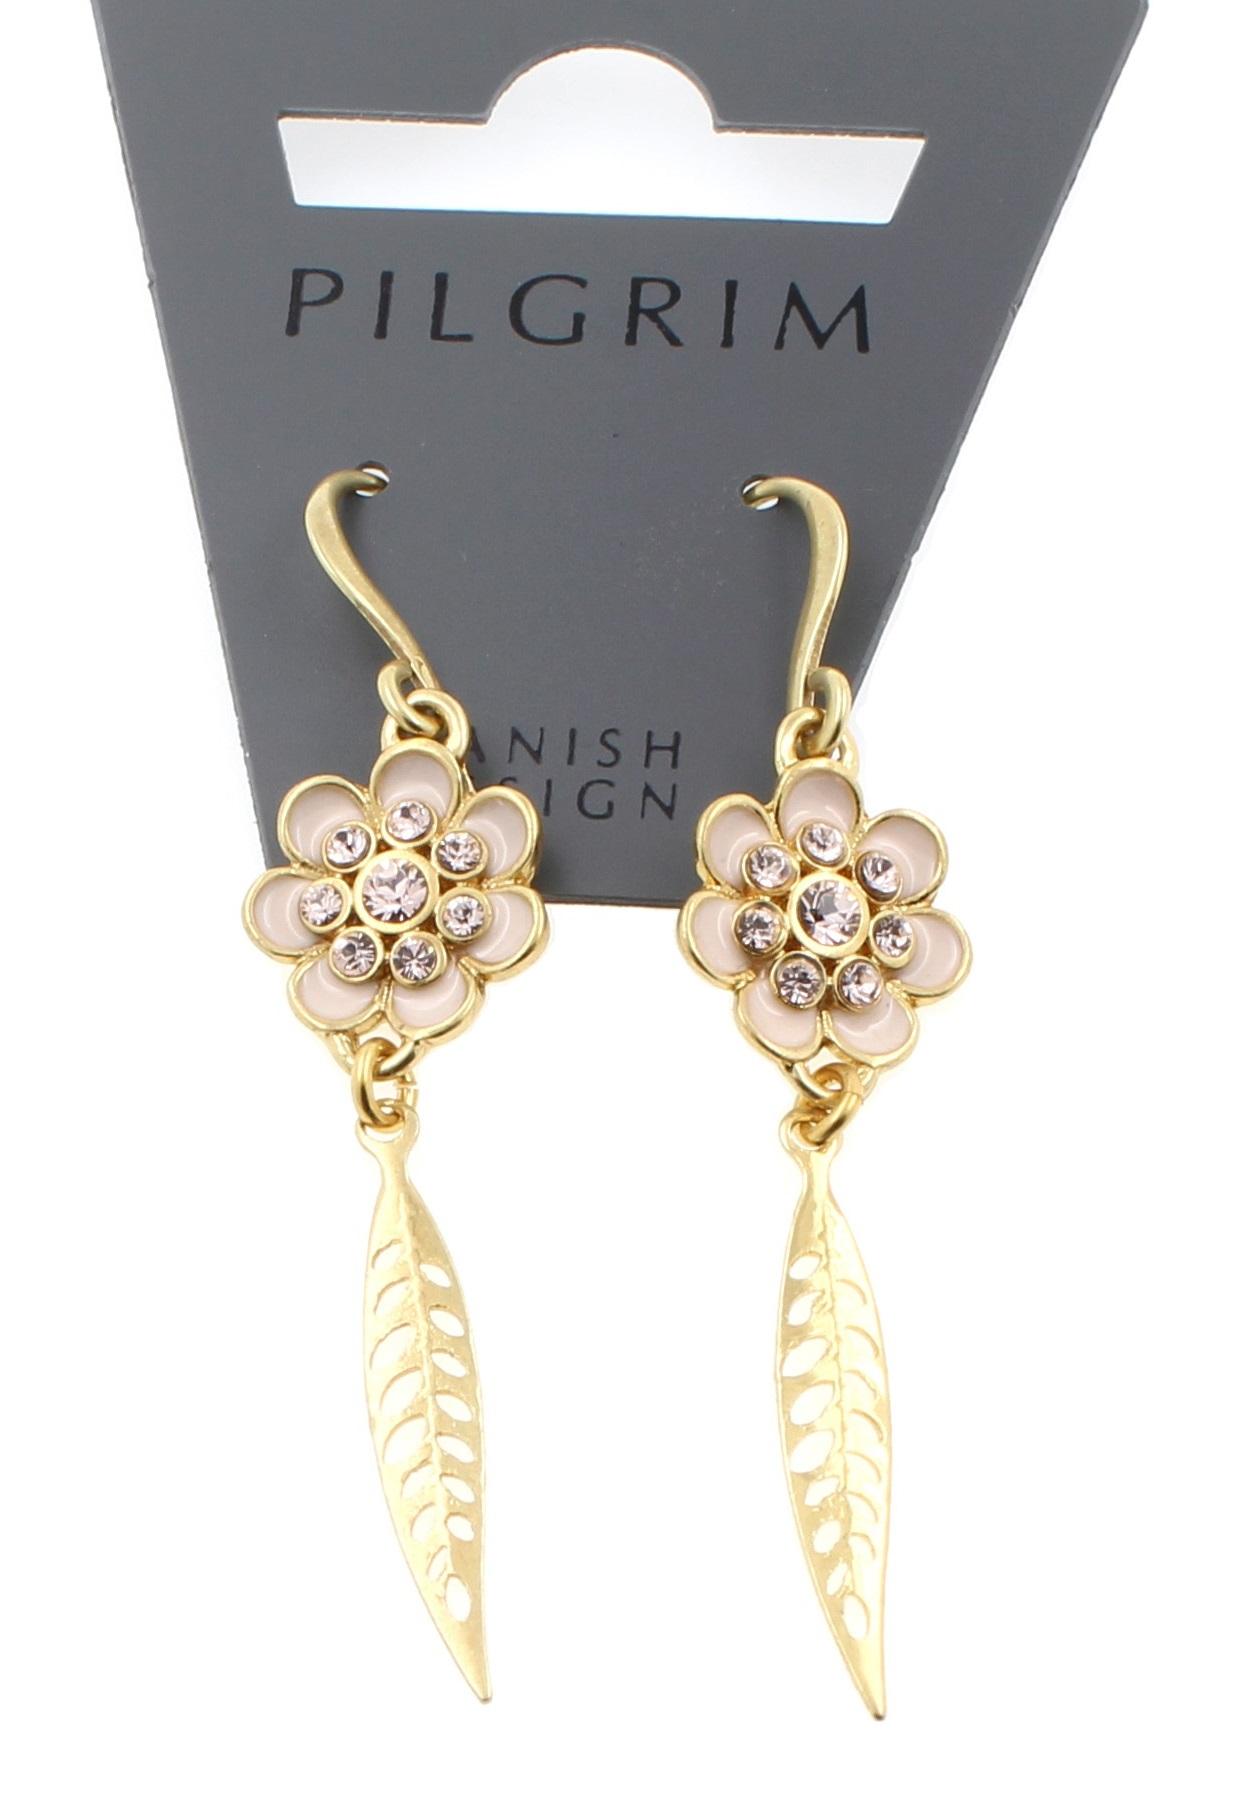 PILGRIM - Bohemian - Flower & Leaf Drop Earrings - Pink/Gold Plate BNWT